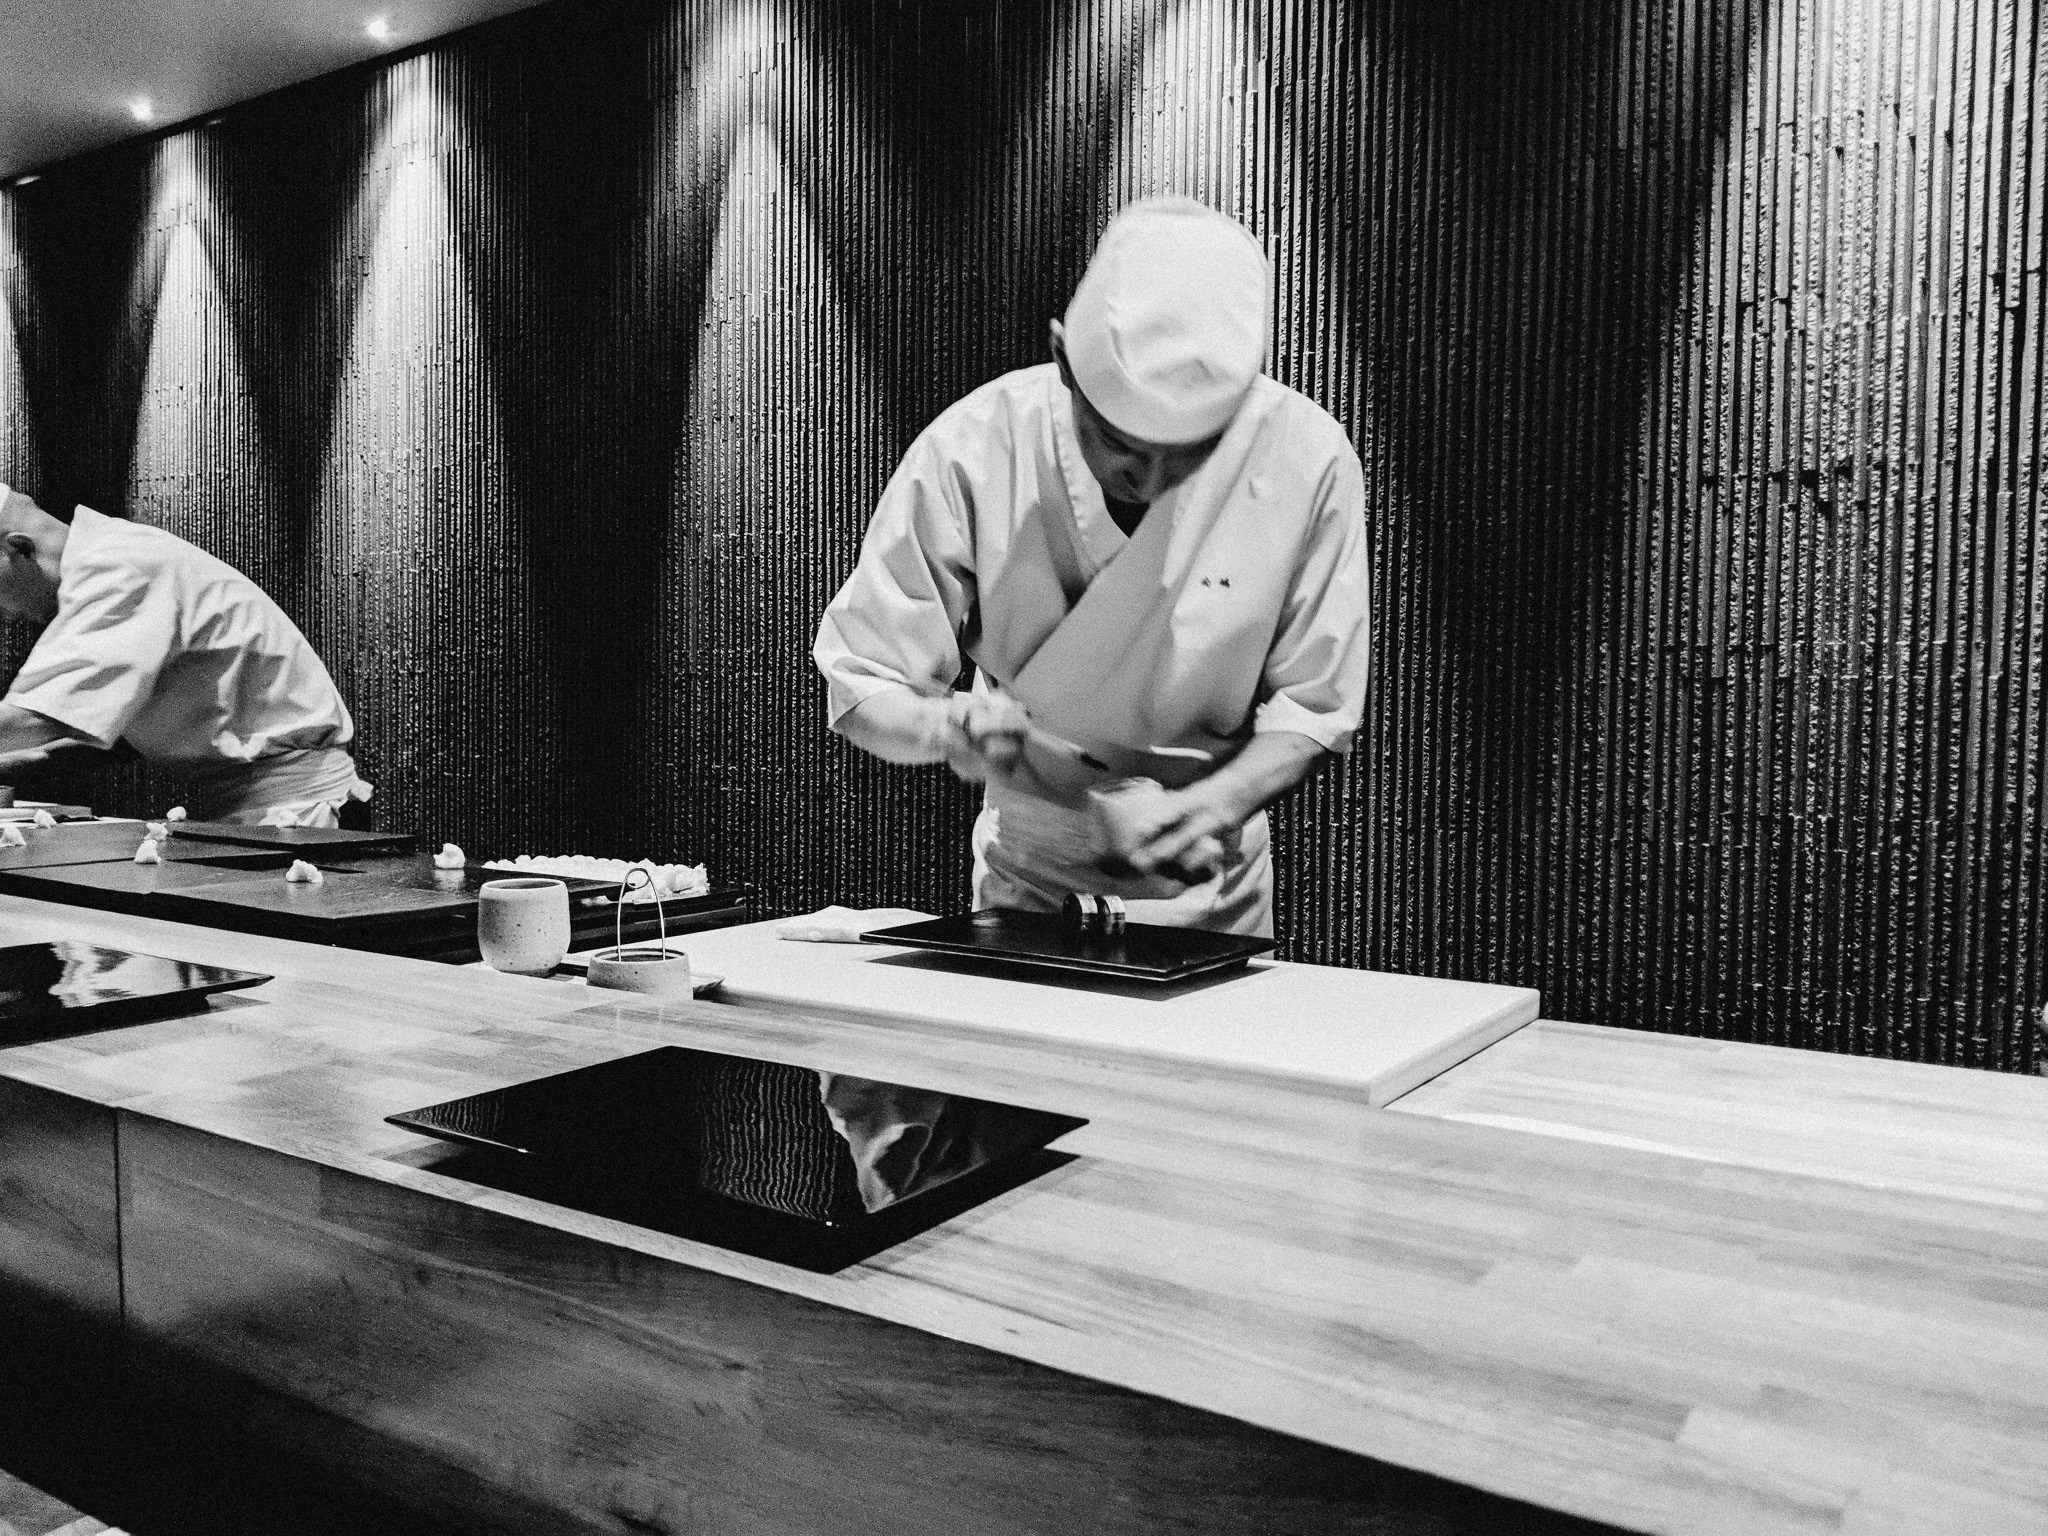 minamishima-melbourne-food-photographer-013.JPG